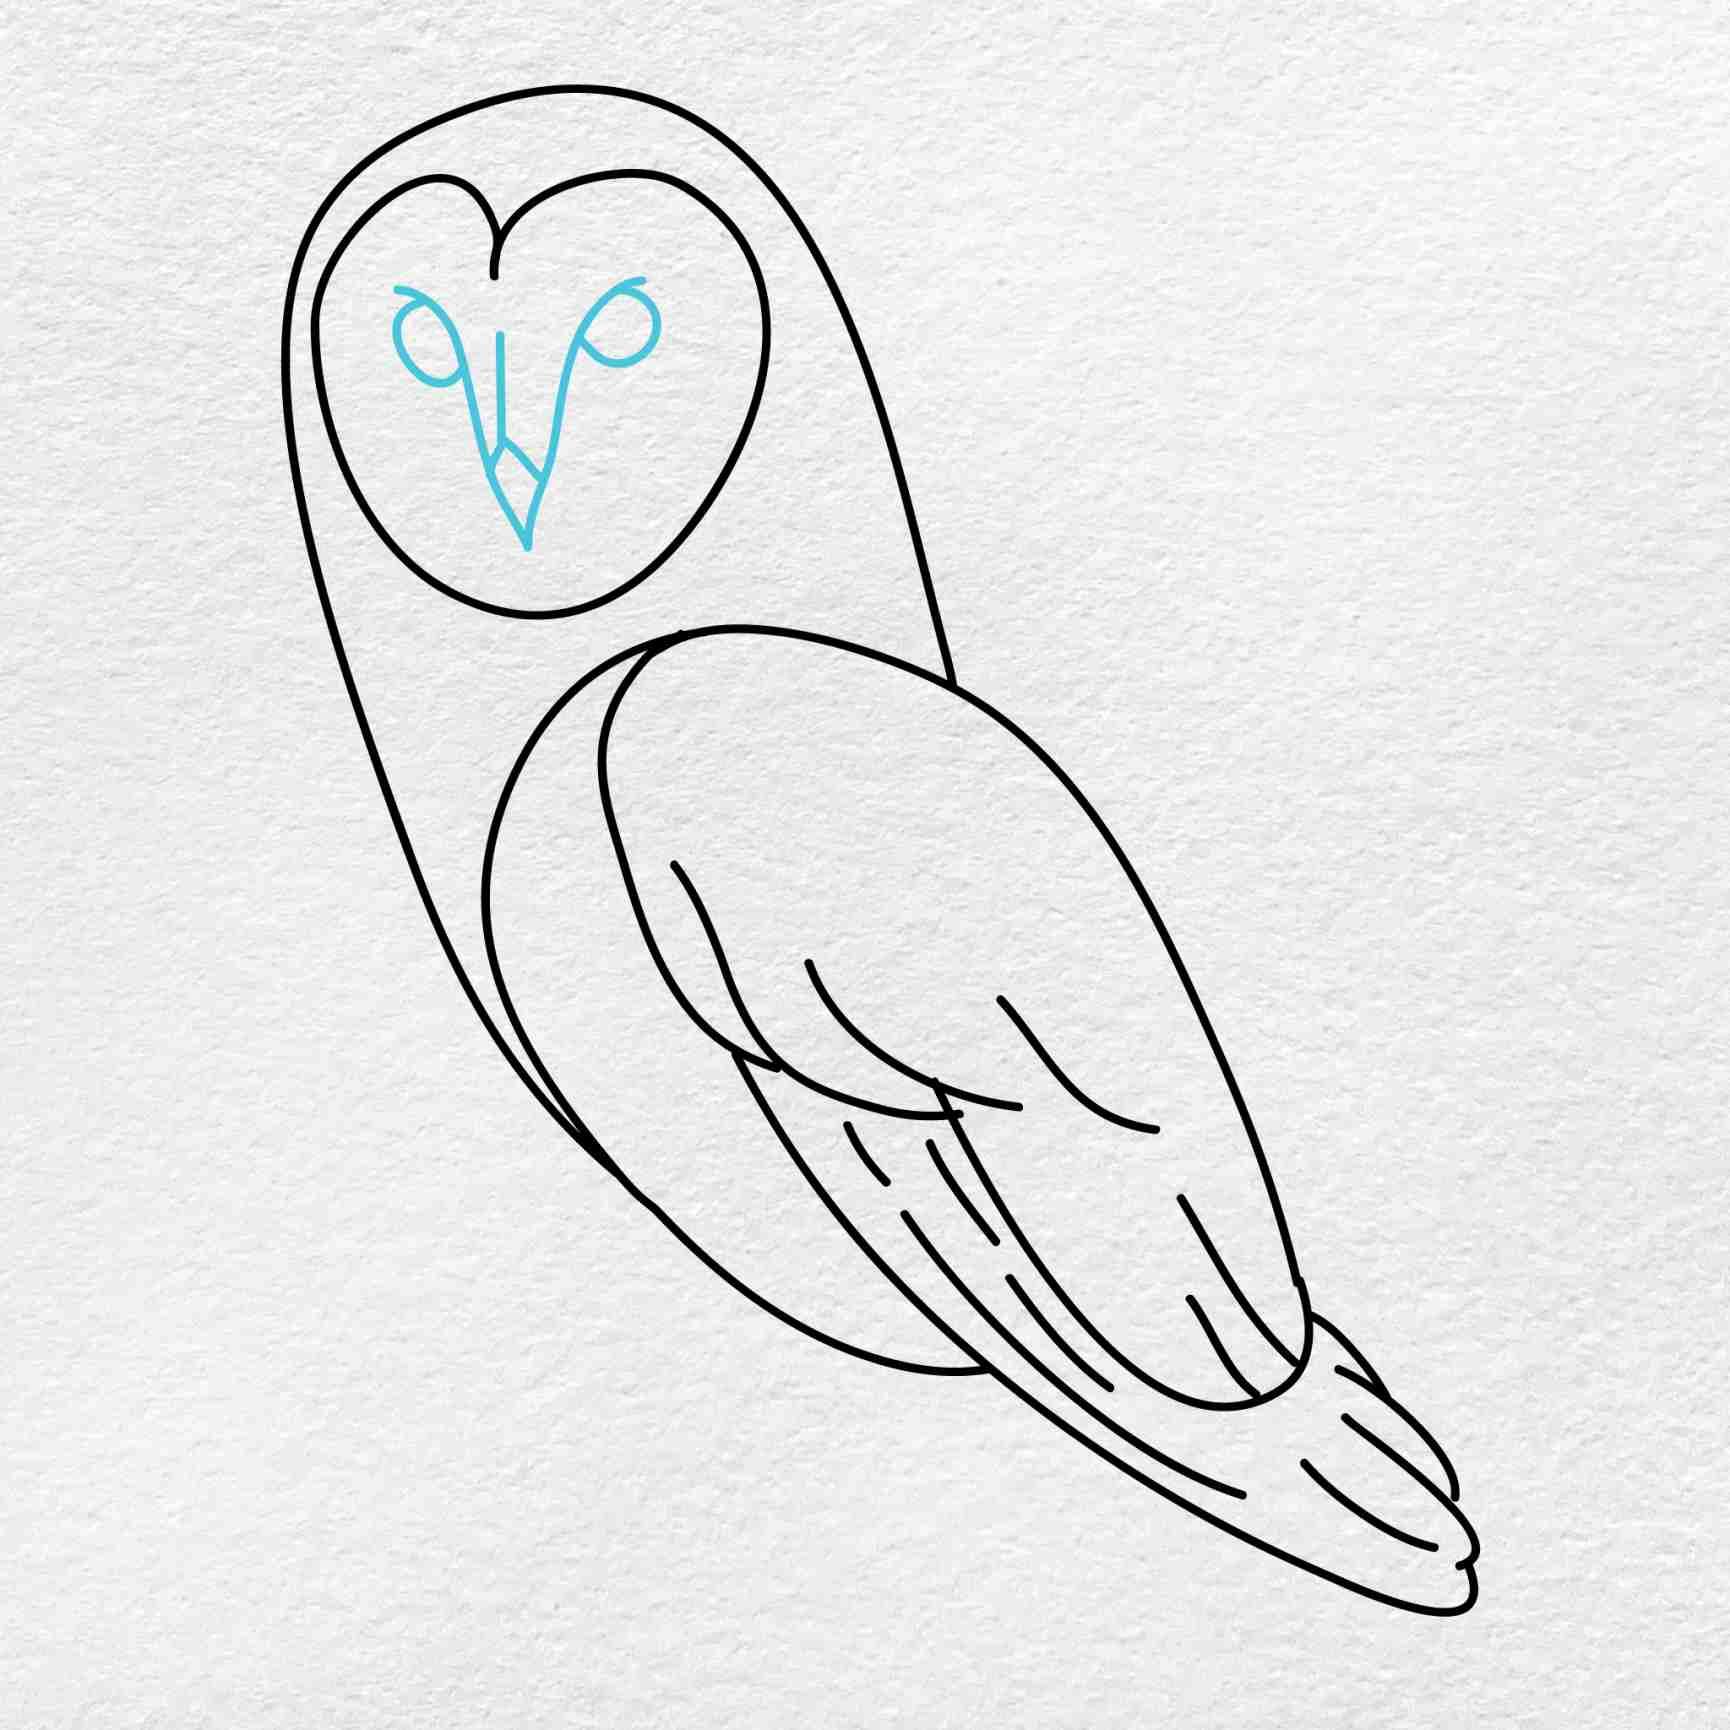 Barn Owl Drawing: Step 6